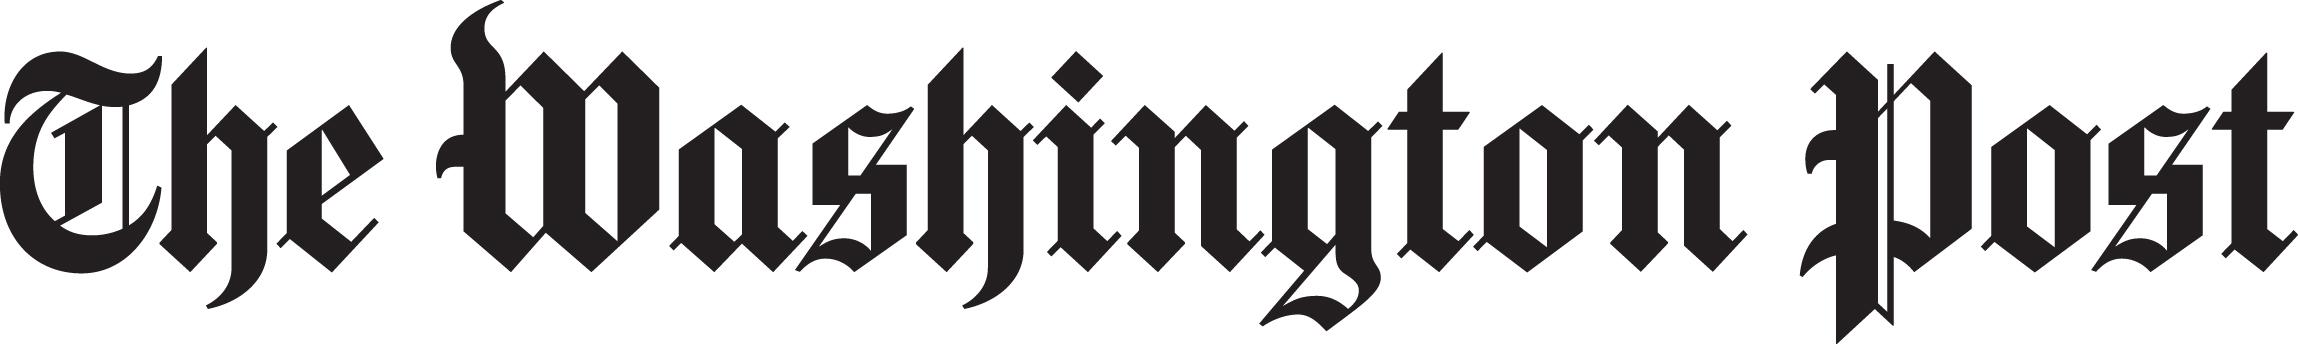 Wash Post logo Black